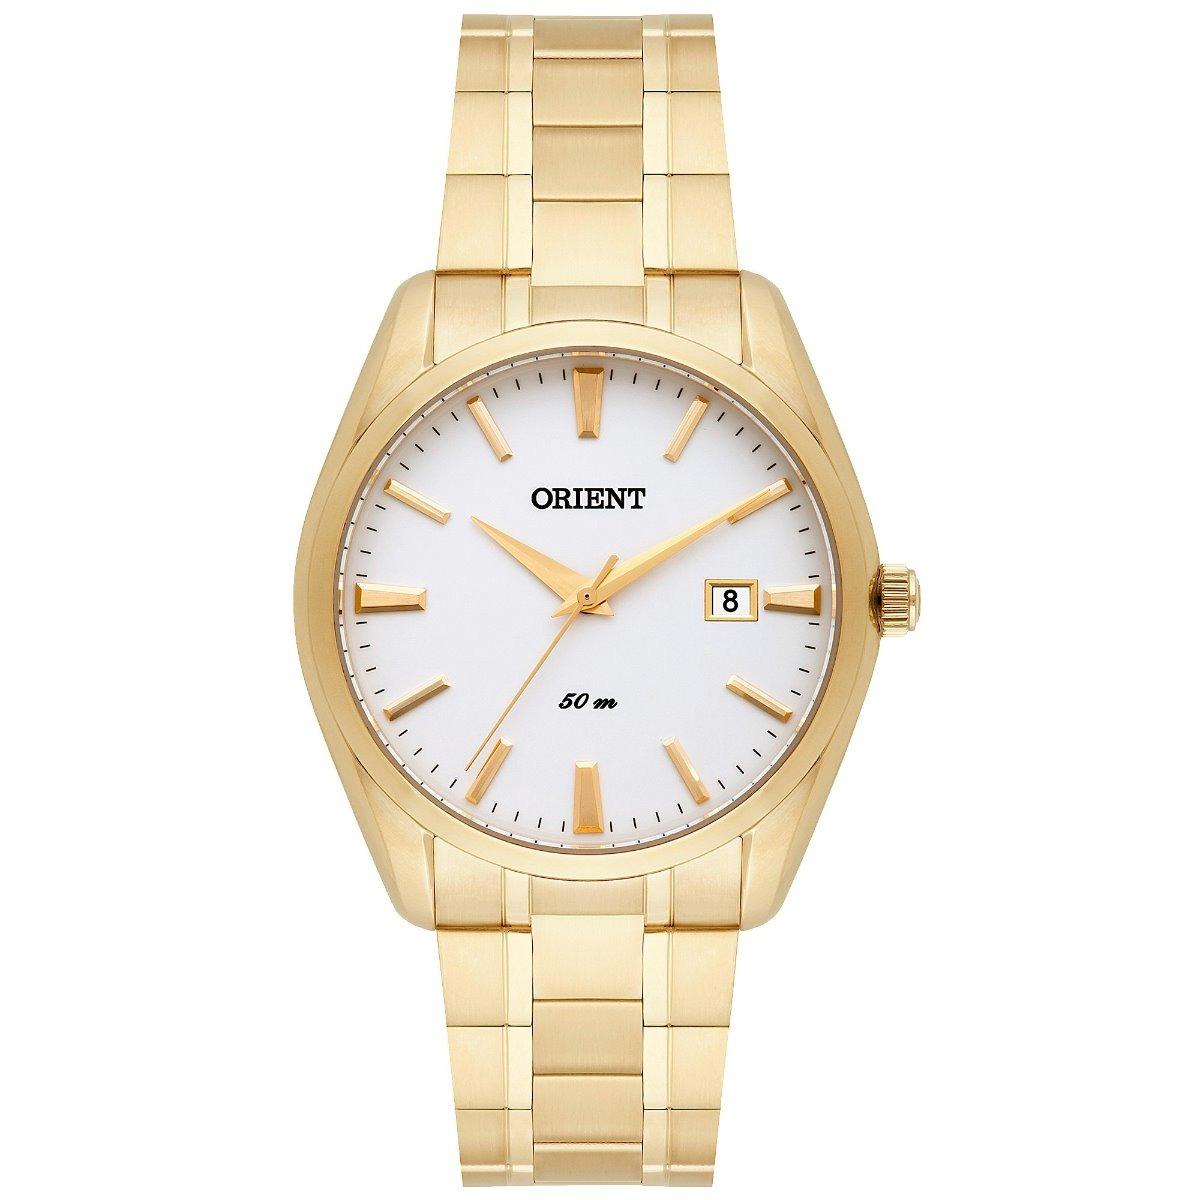 d79958e7d3b Relógio Orient Feminino Fgss1136-b1kx - 19 - R  289